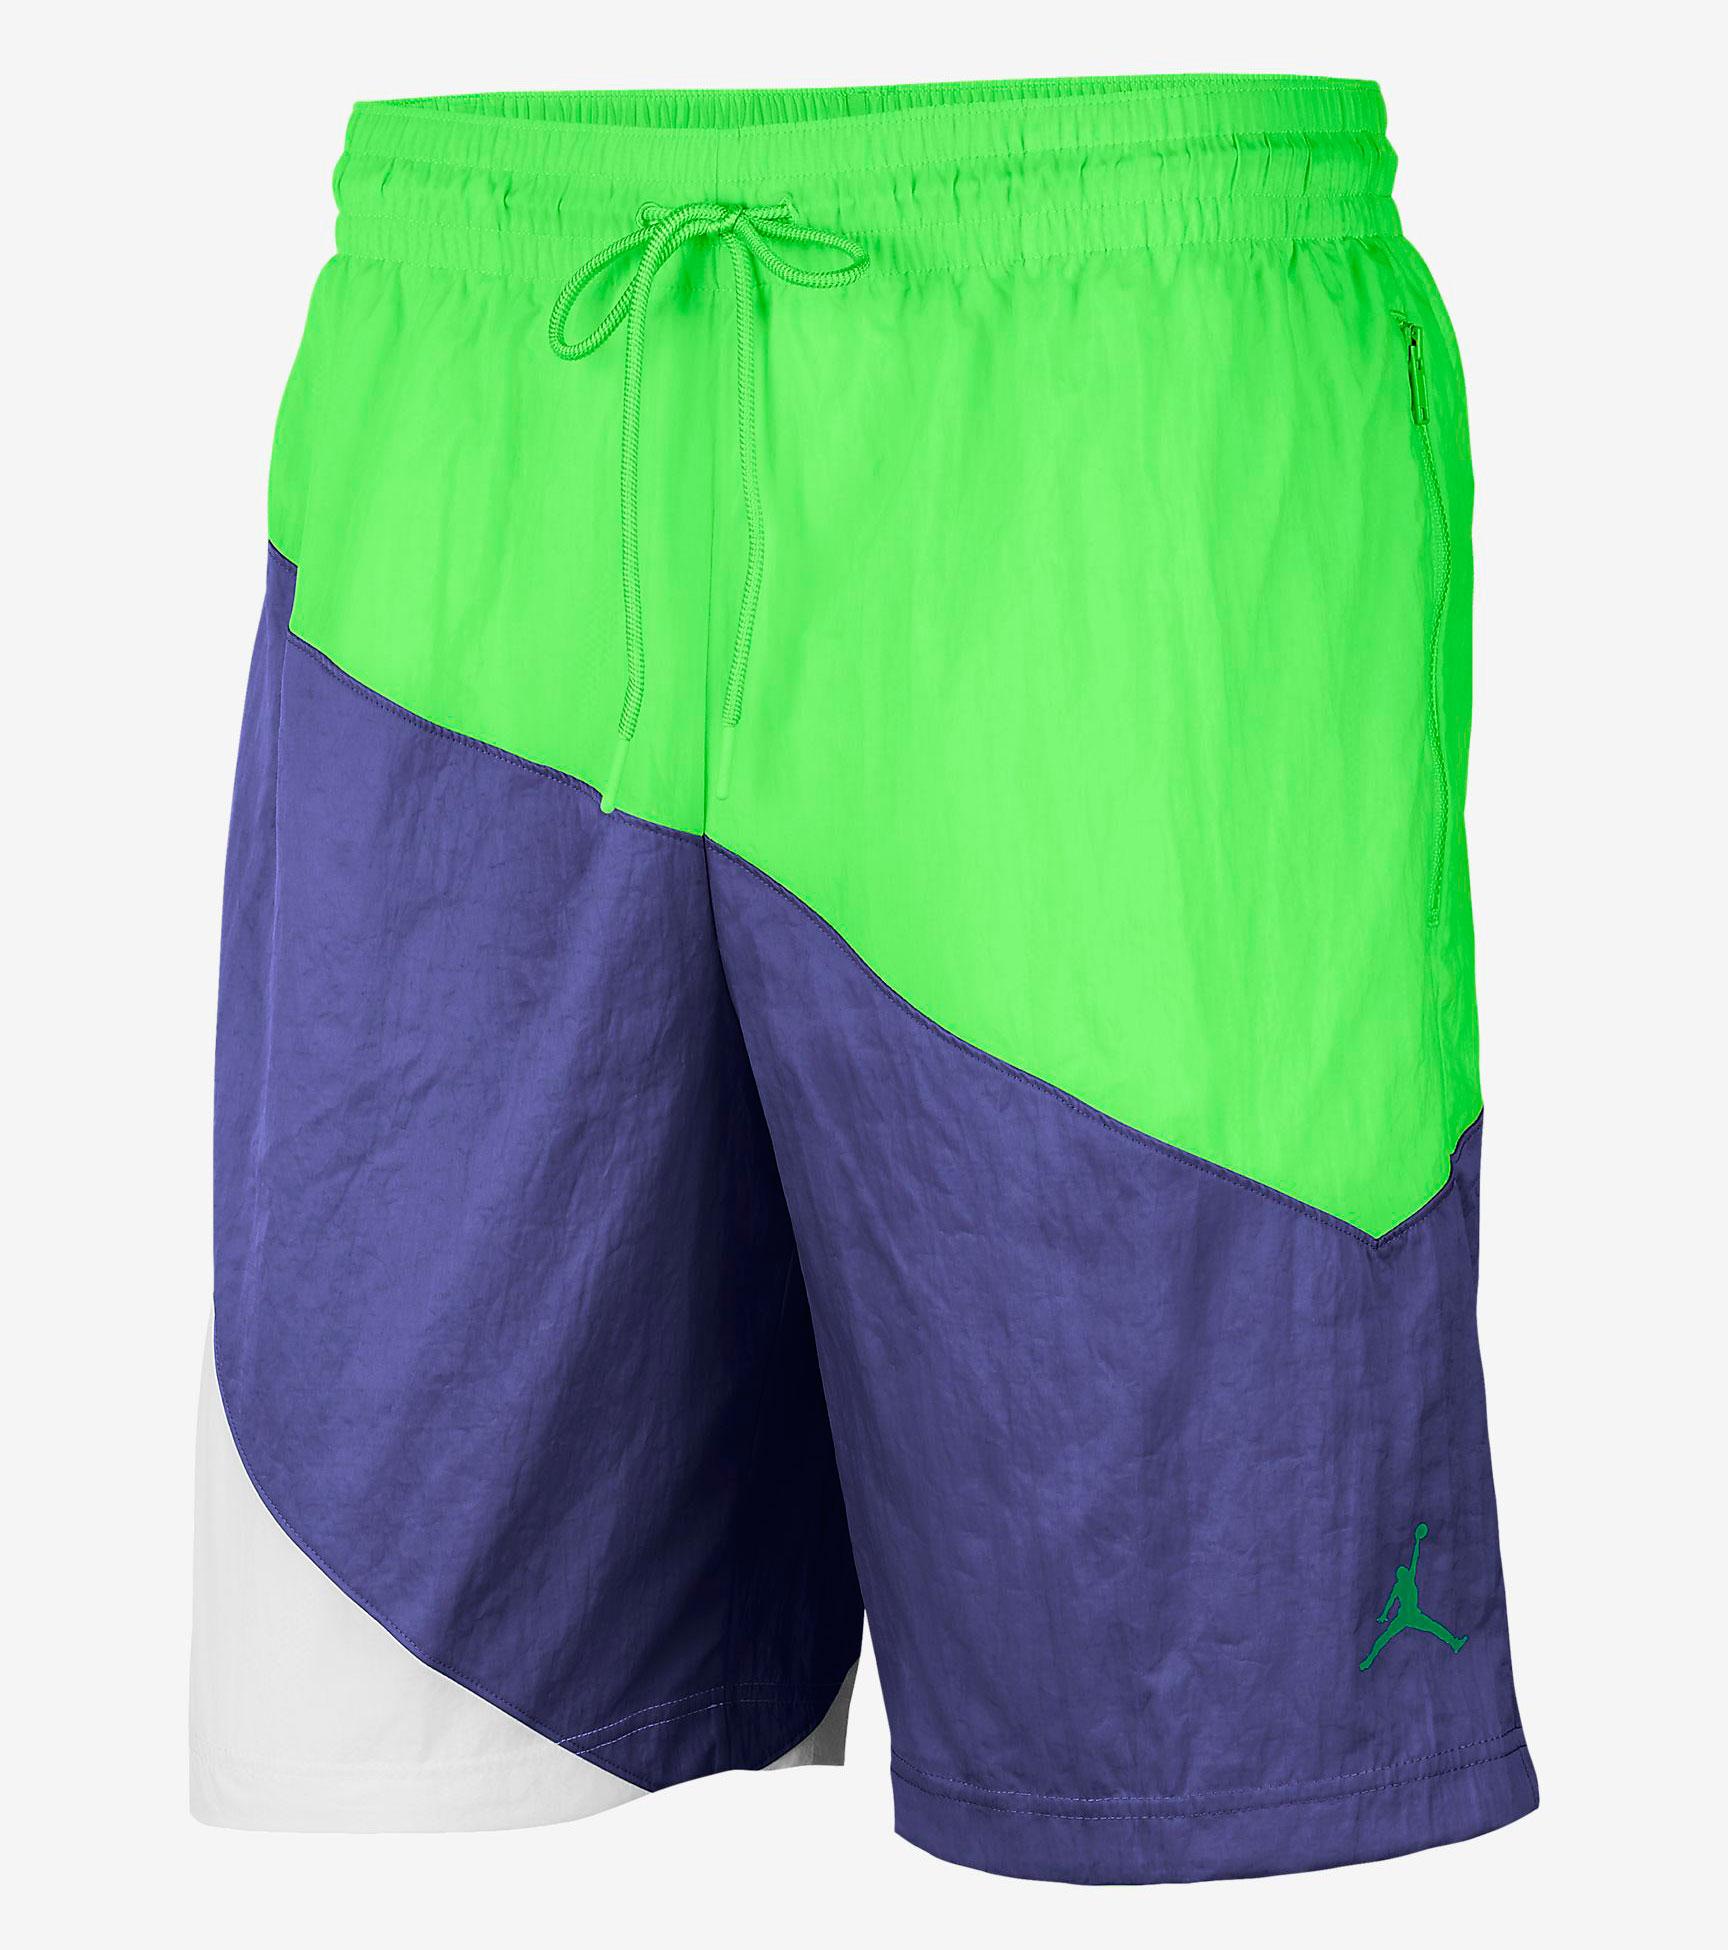 air-jordan-1-mid-hulk-shorts-1